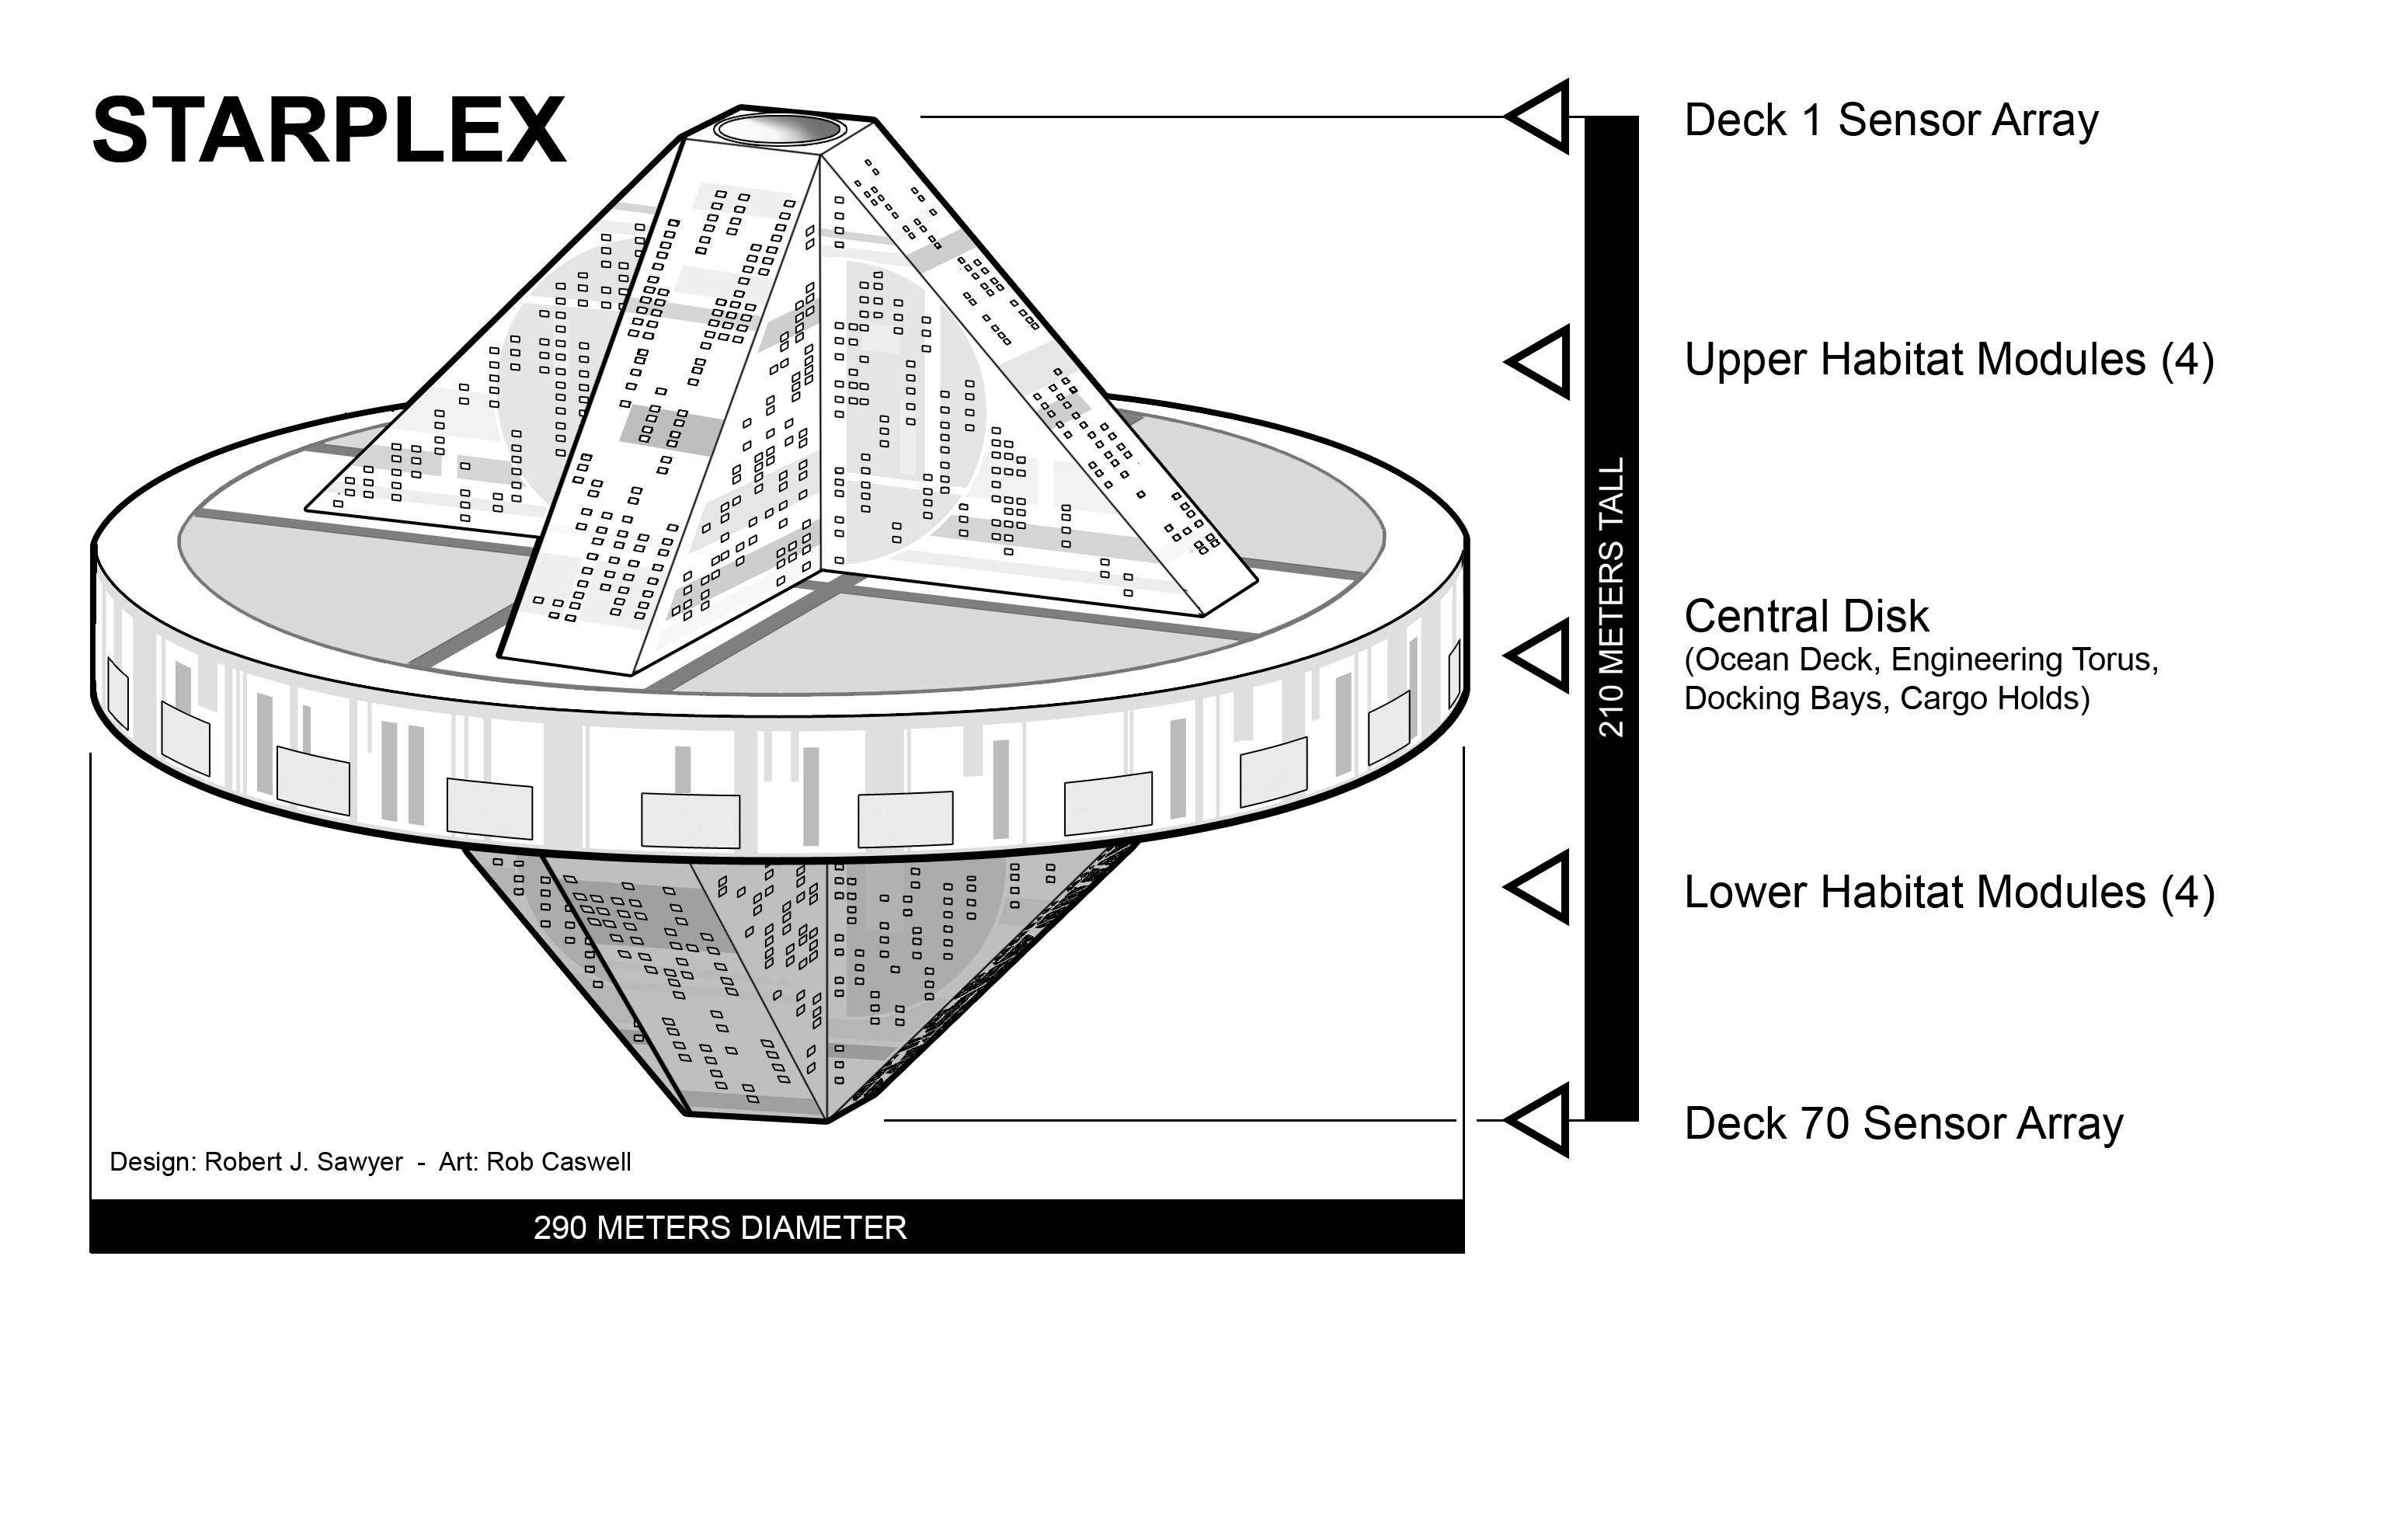 [Starplex Diagram]